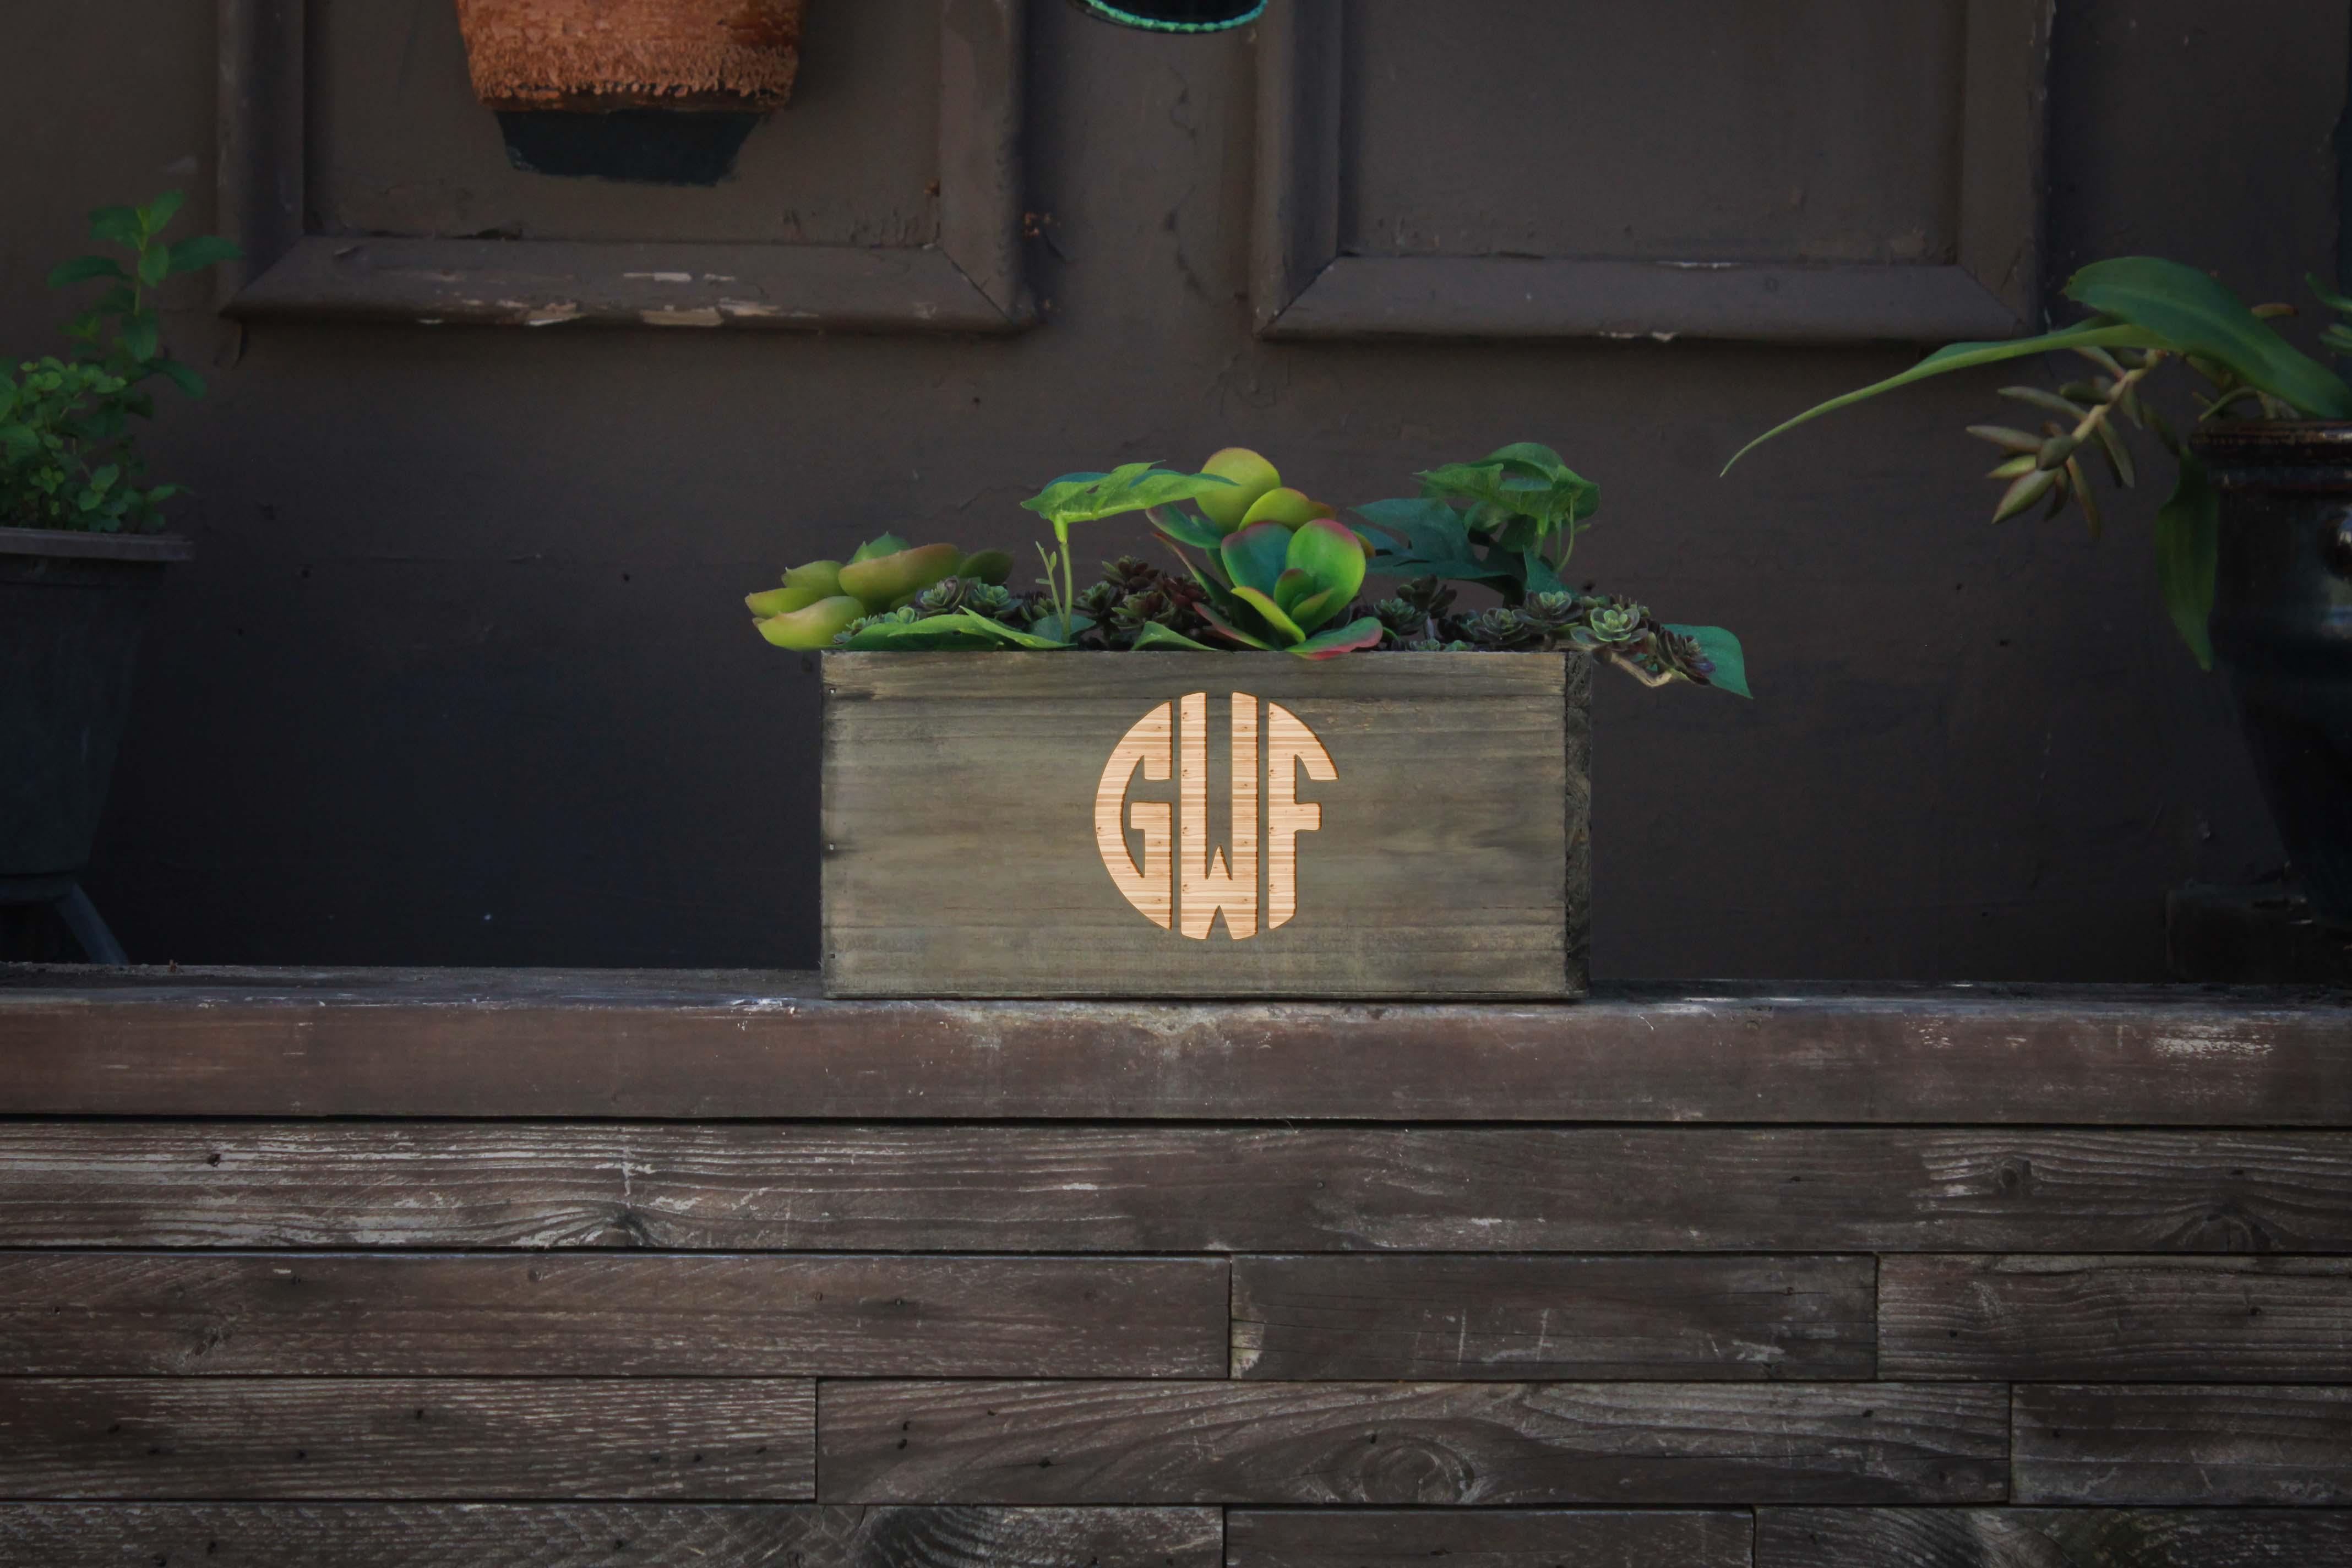 10 X 5 Personalized Planter Box   GWF